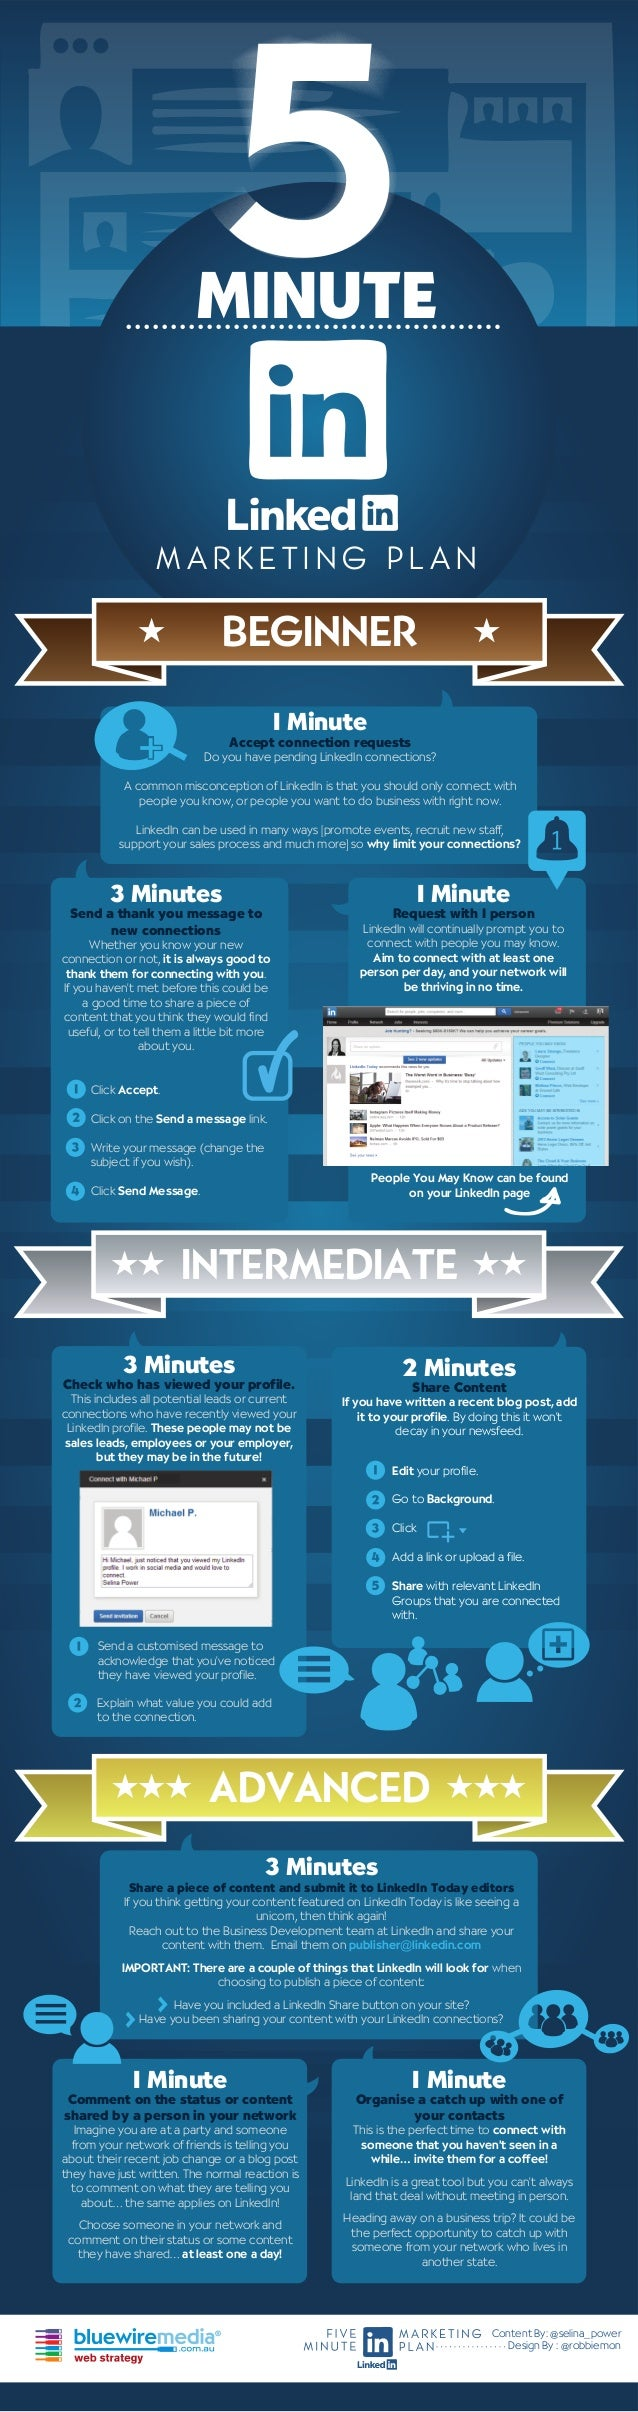 LinkedIn 5 Minute Marketing Plan infographic